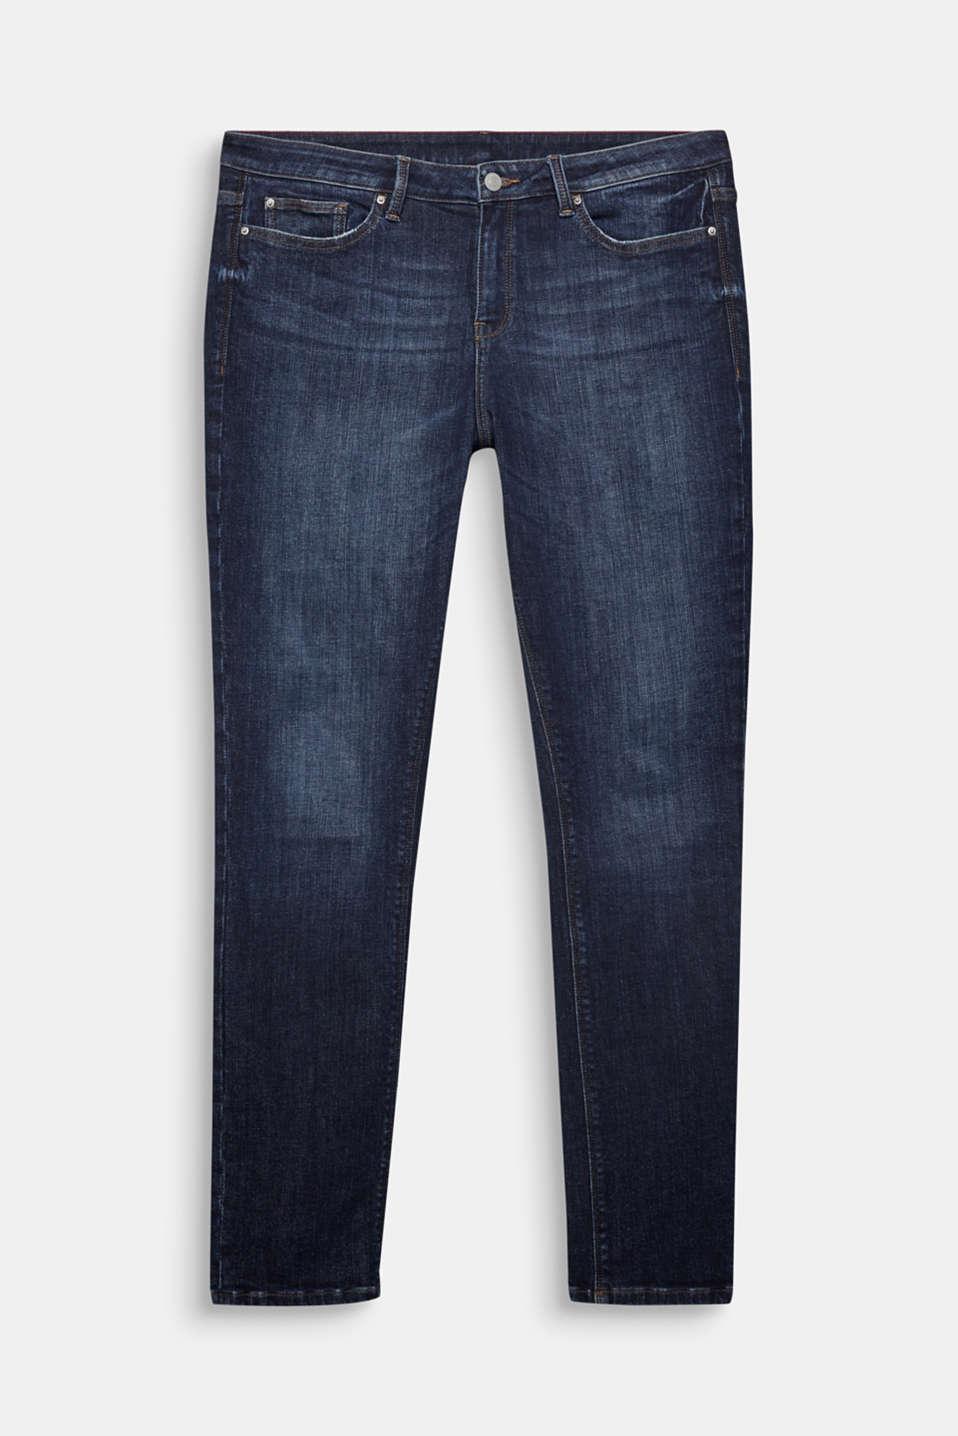 CURVY basic stretch jeans, BLUE DARK WASH, detail image number 7